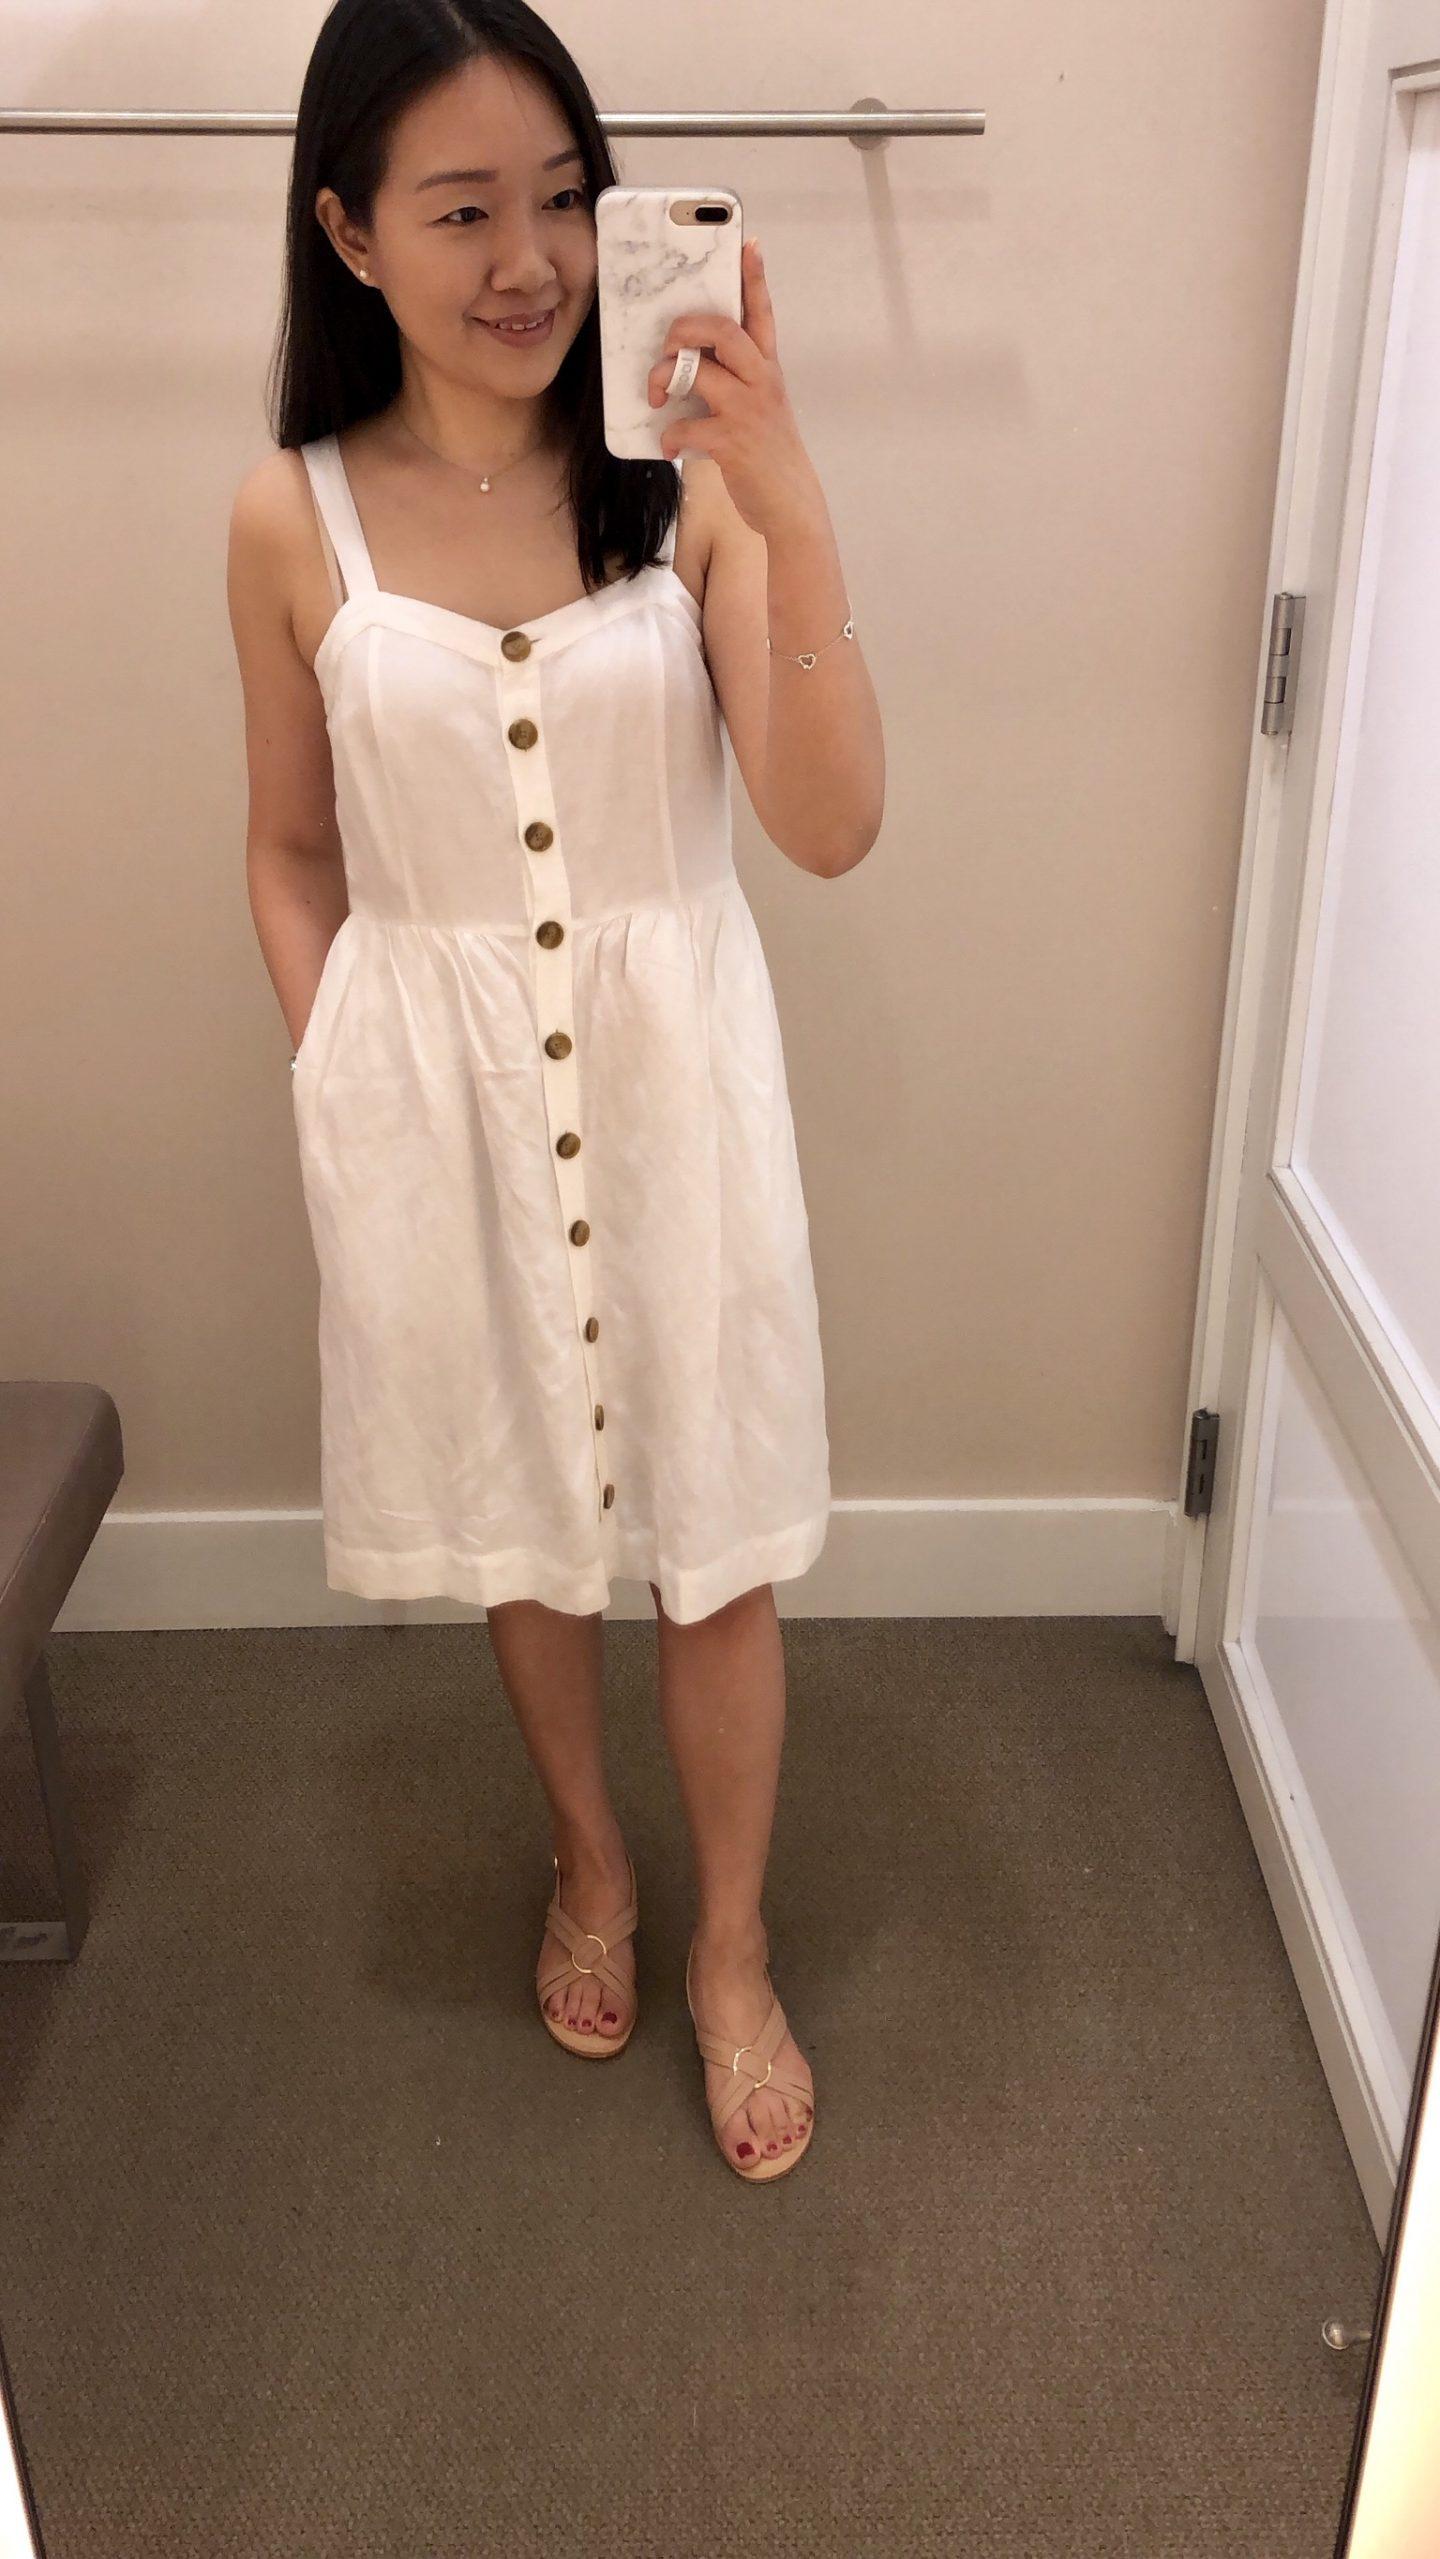 LOFT Striped Button Down Flare Dress, size 2P